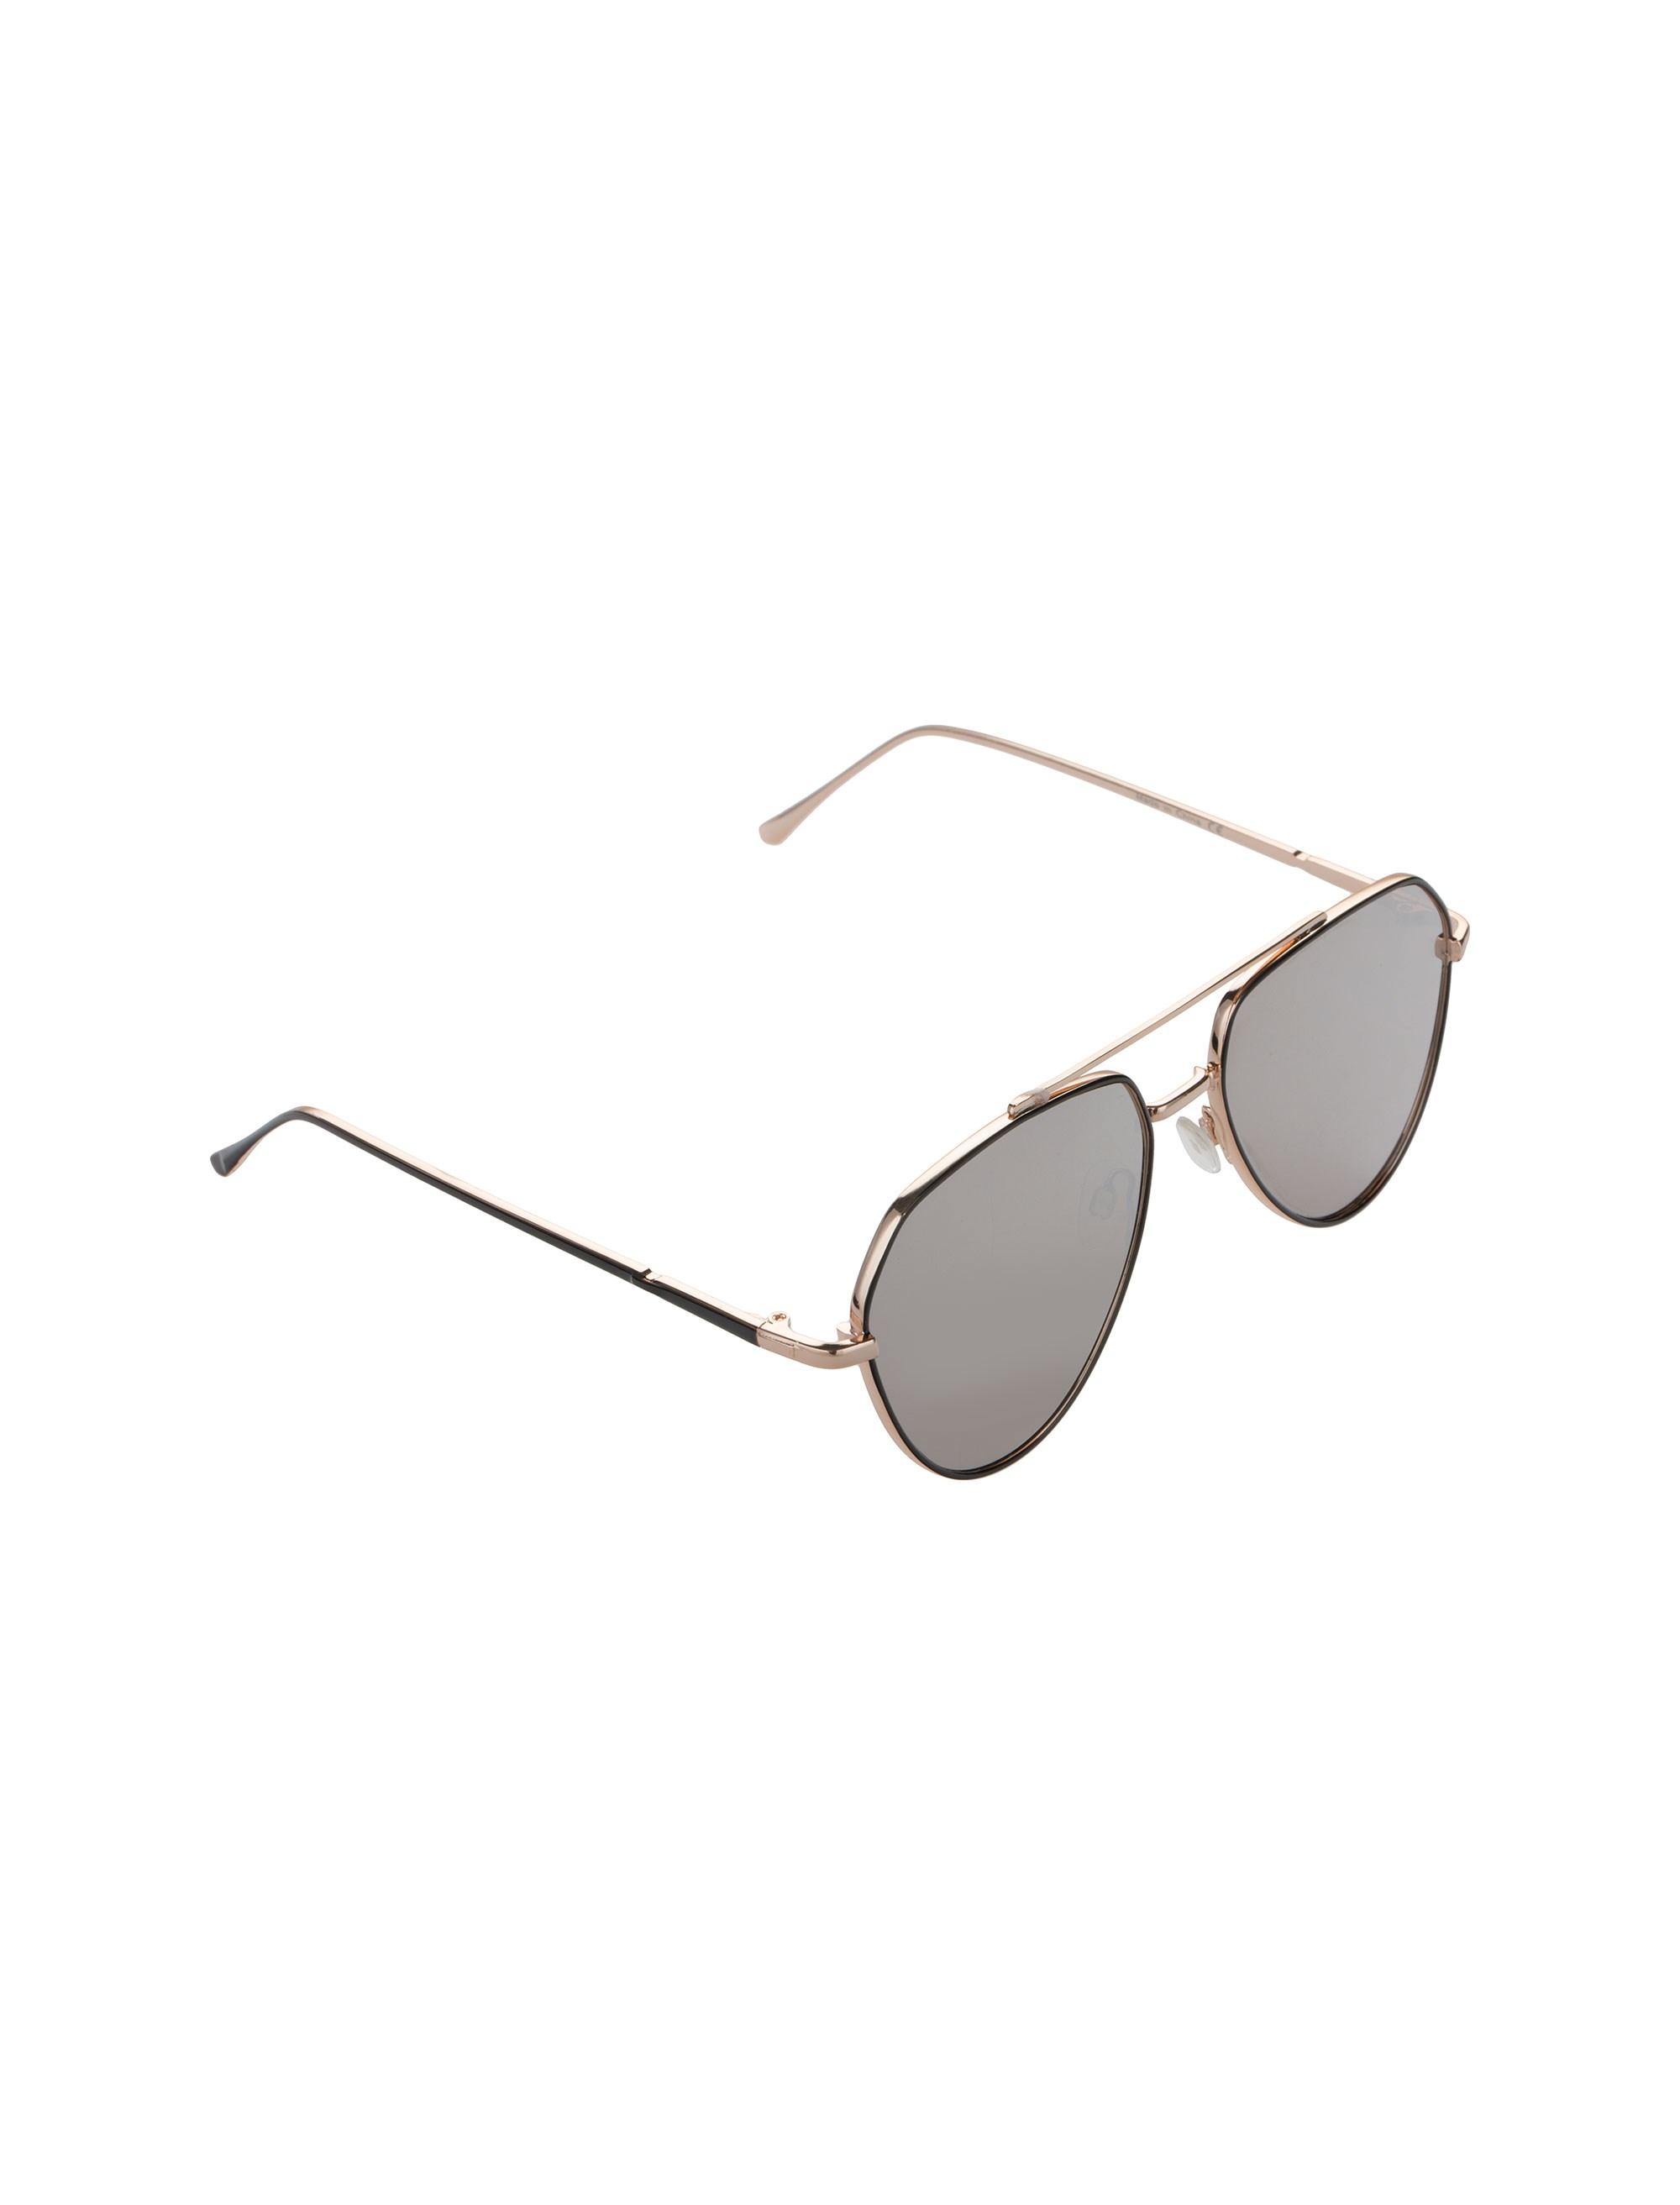 عینک آفتابی خلبانی مردانه - آلدو - طلايي - 2